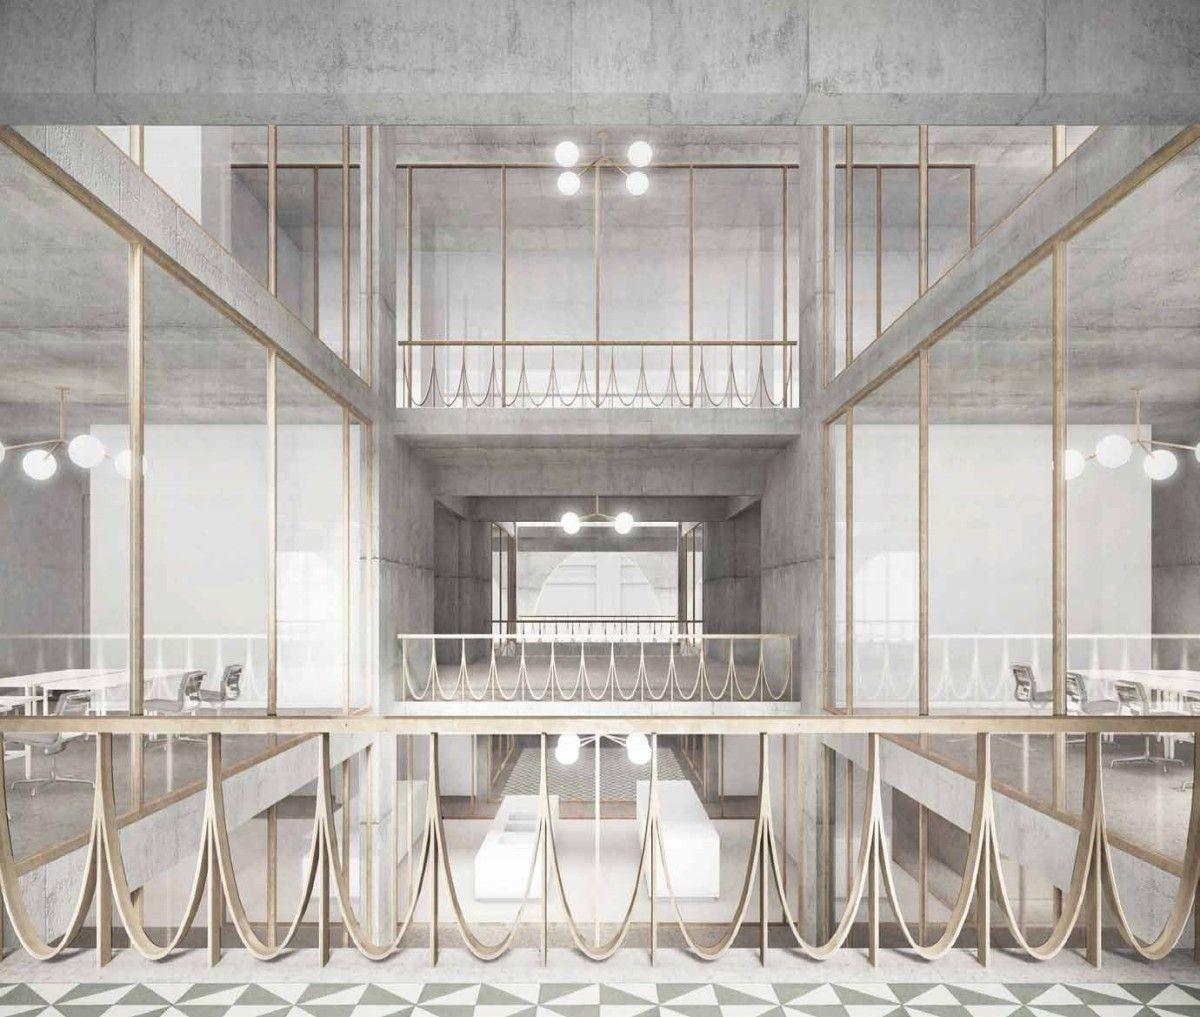 fiechter salzmann new university biomedicine department basel 1 archi pinterest. Black Bedroom Furniture Sets. Home Design Ideas